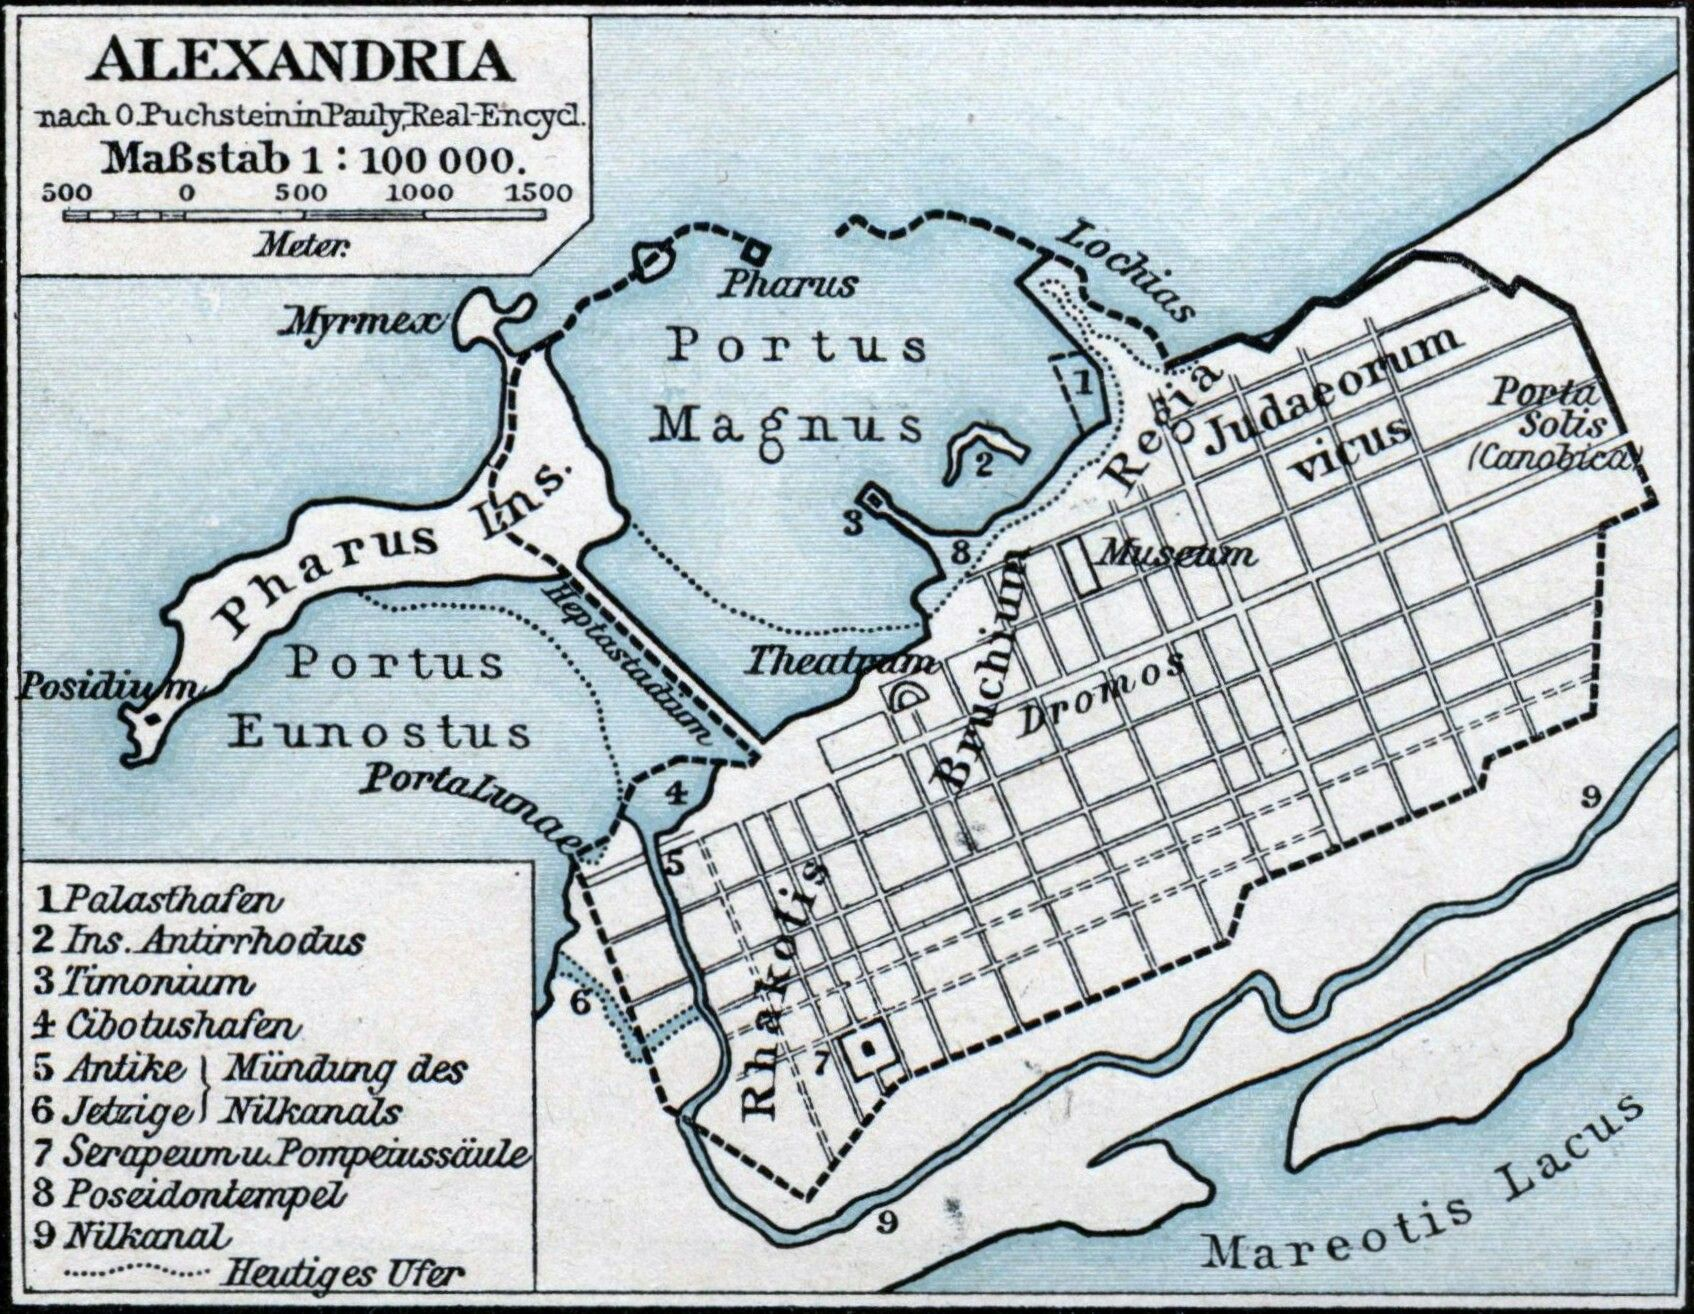 Pin By Banan Molham On Alexandria Alexandria Ancient Maps Egypt